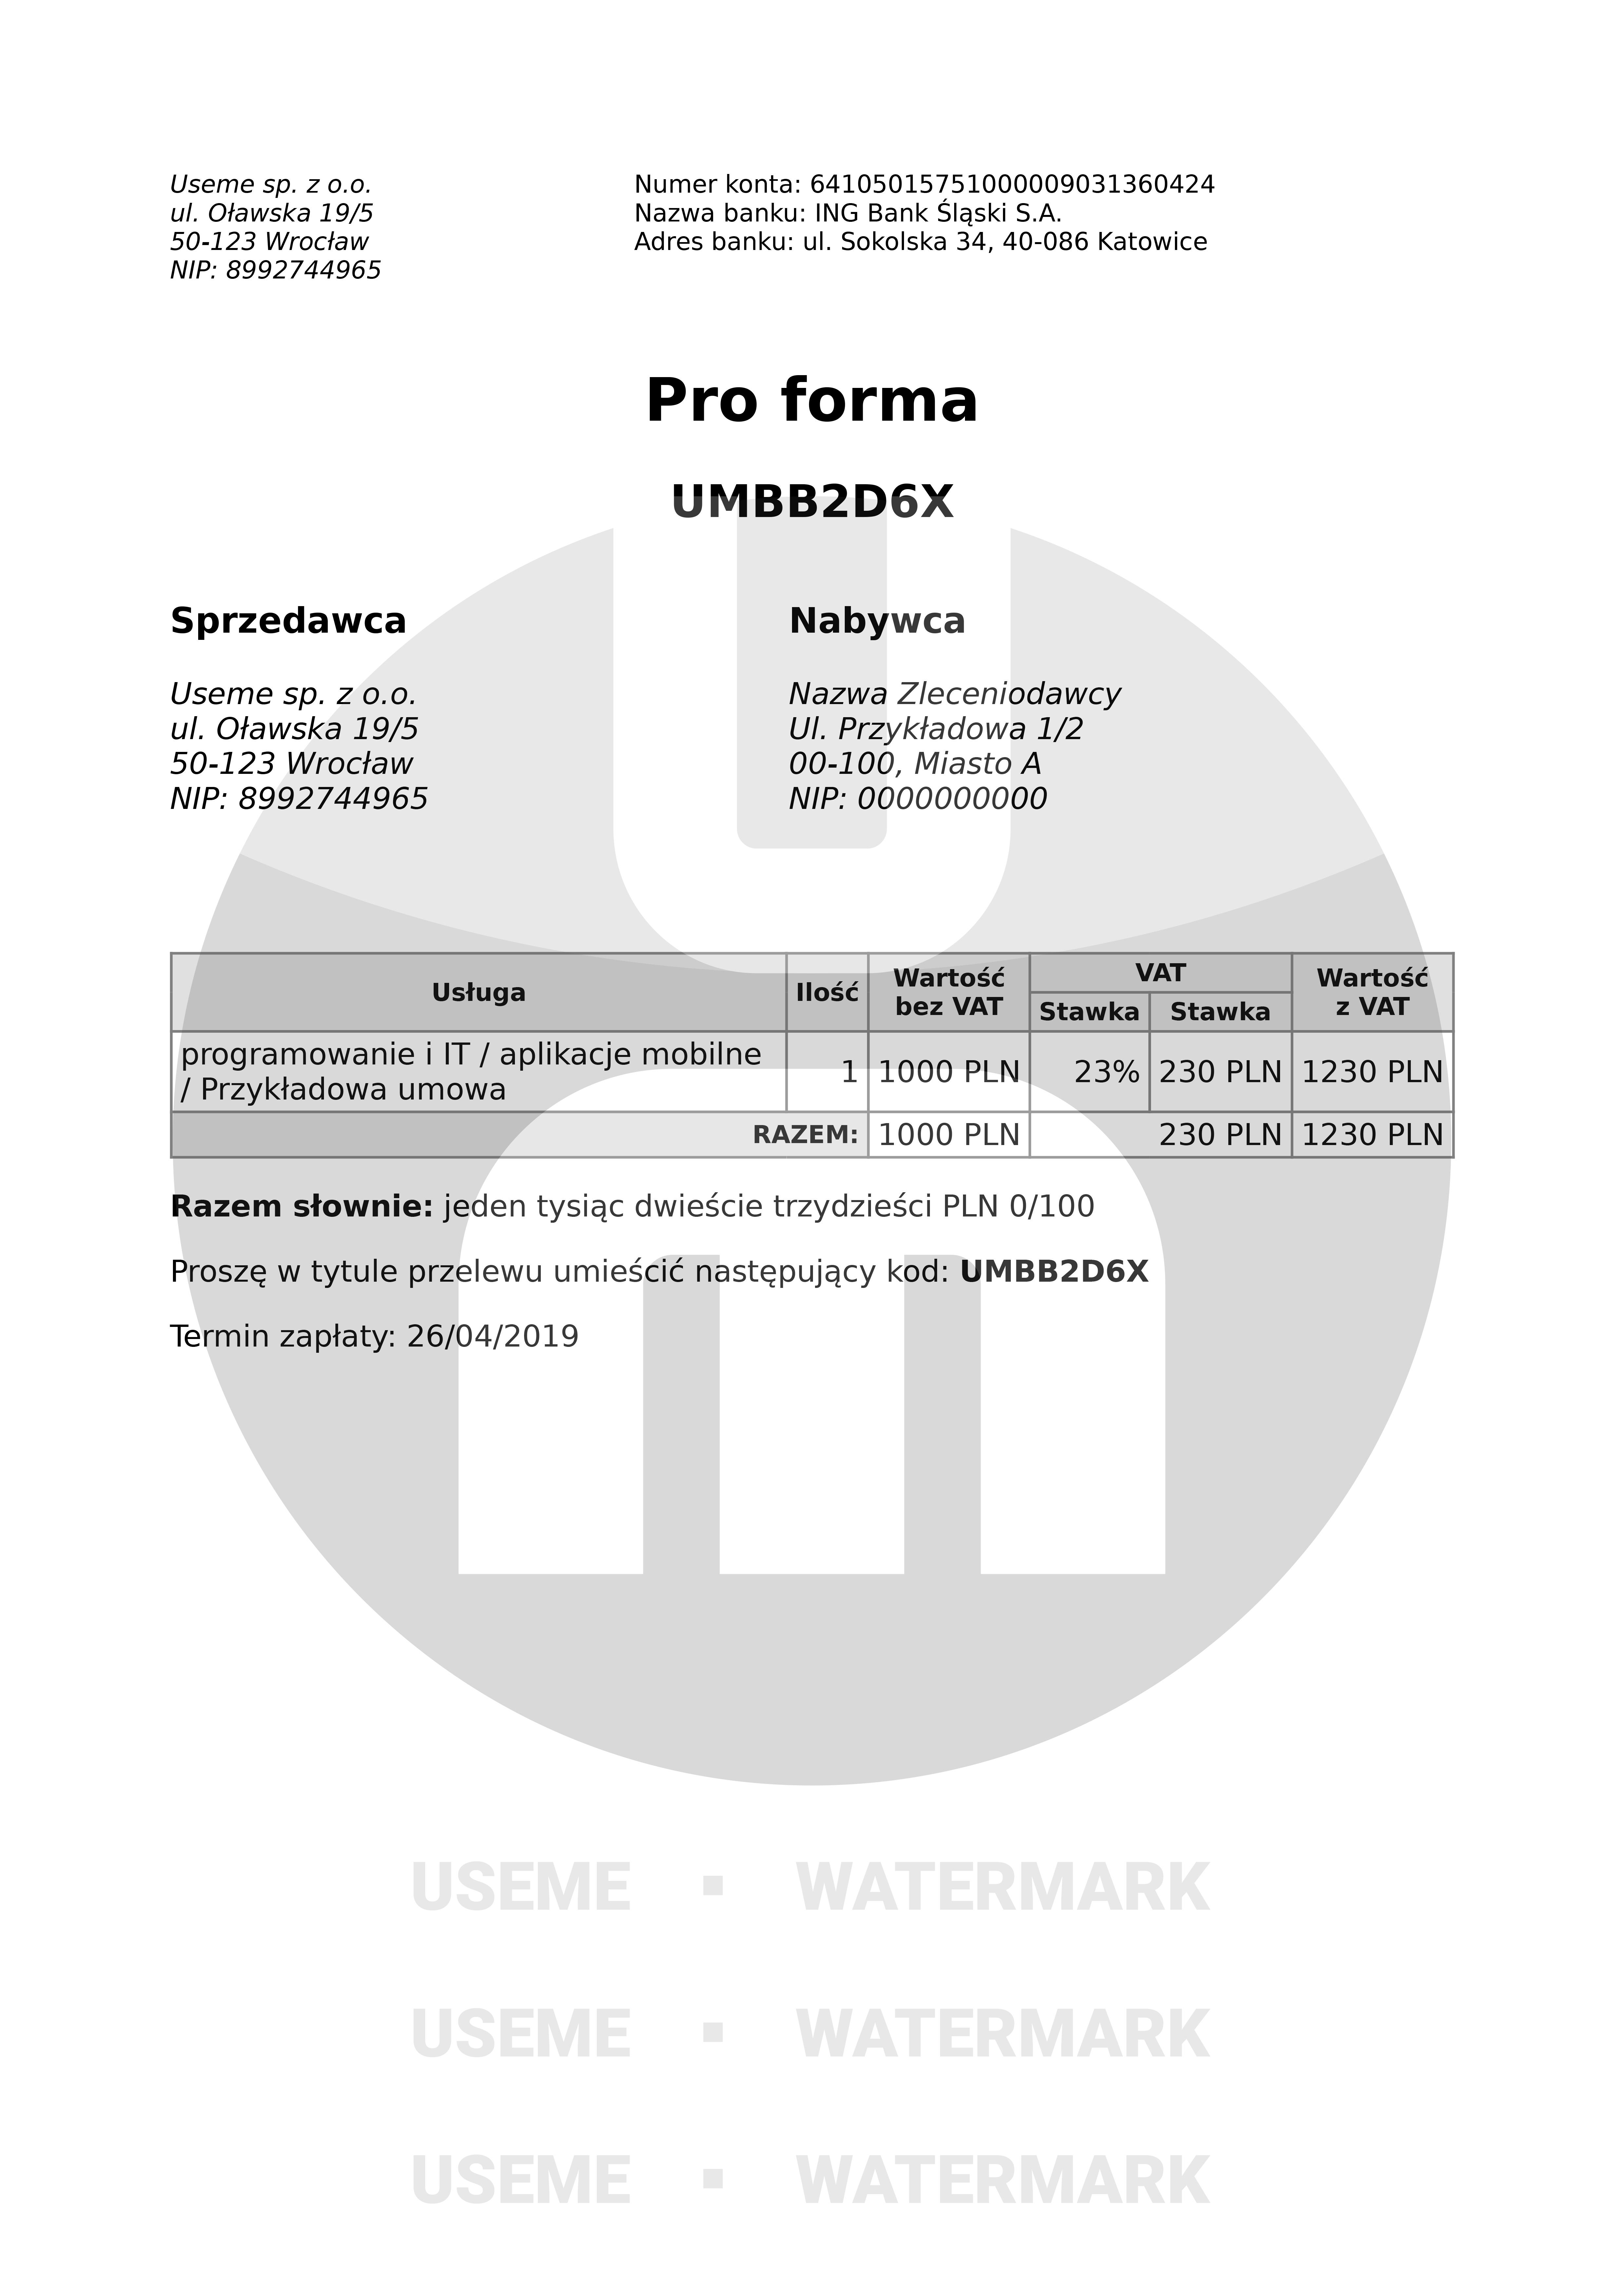 https://useme-prod-public.s3.amazonaws.com/help-images/preinvoice-UMBB2D6X_t.jpg